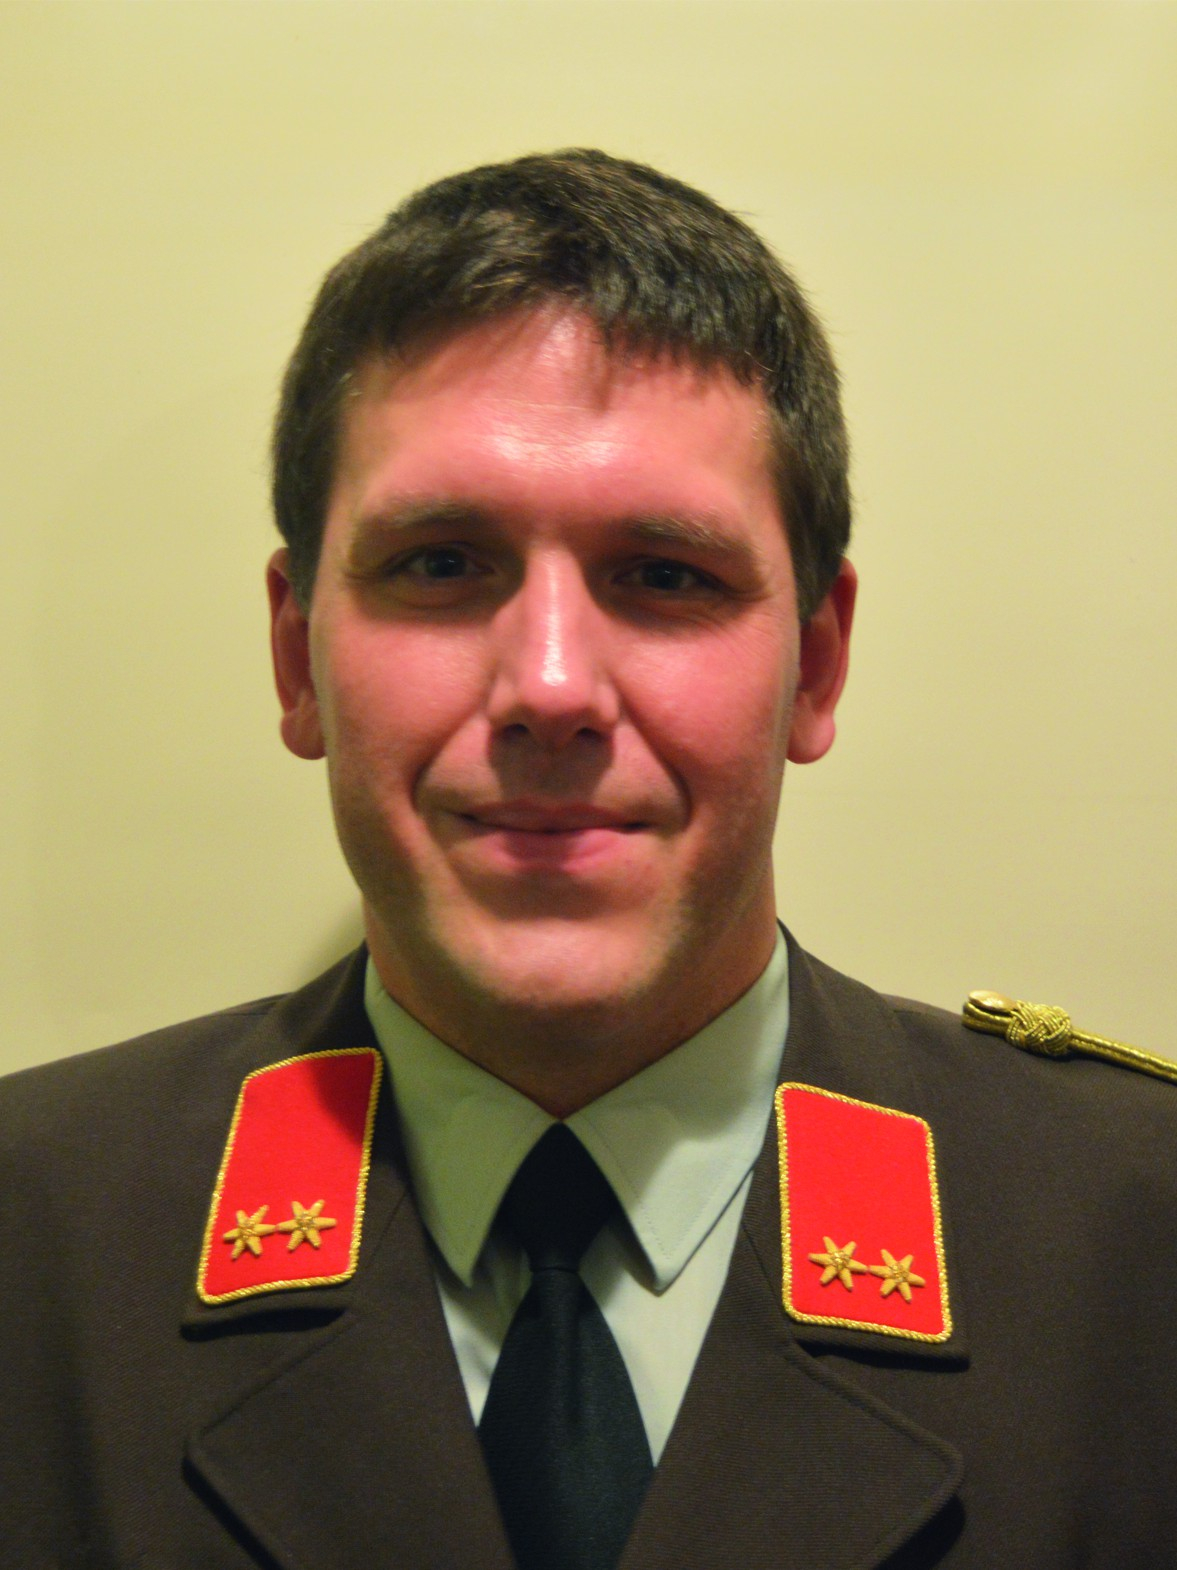 OBI Johannes Fegerl